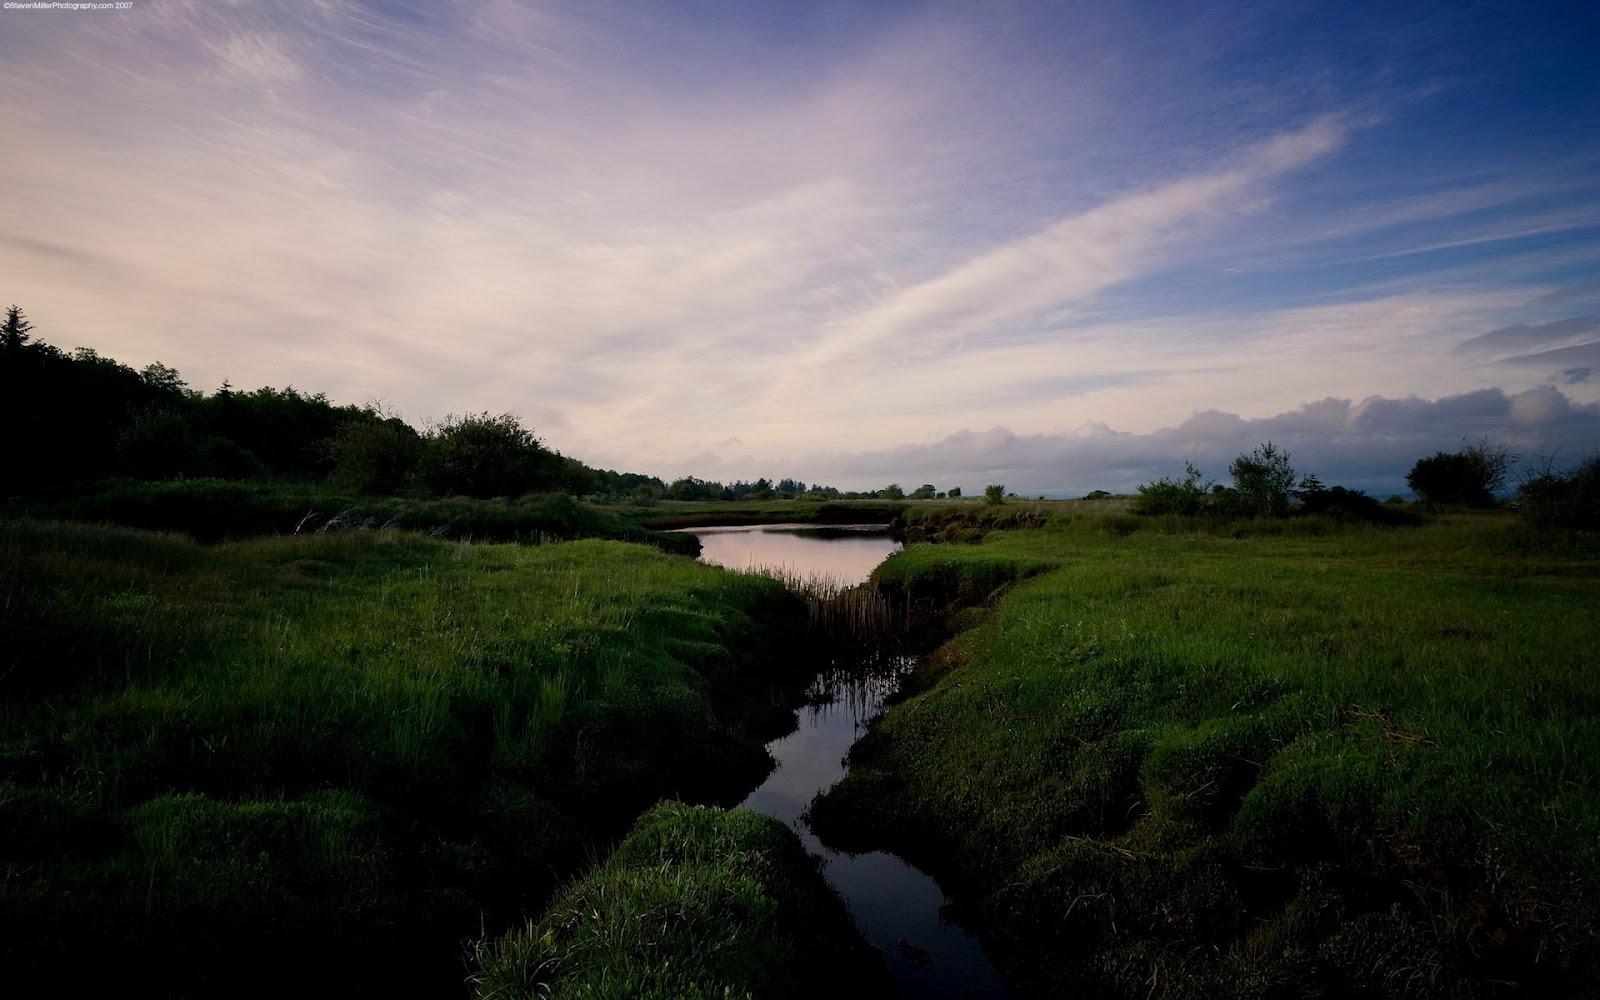 amazon nature wallpaper - photo #18